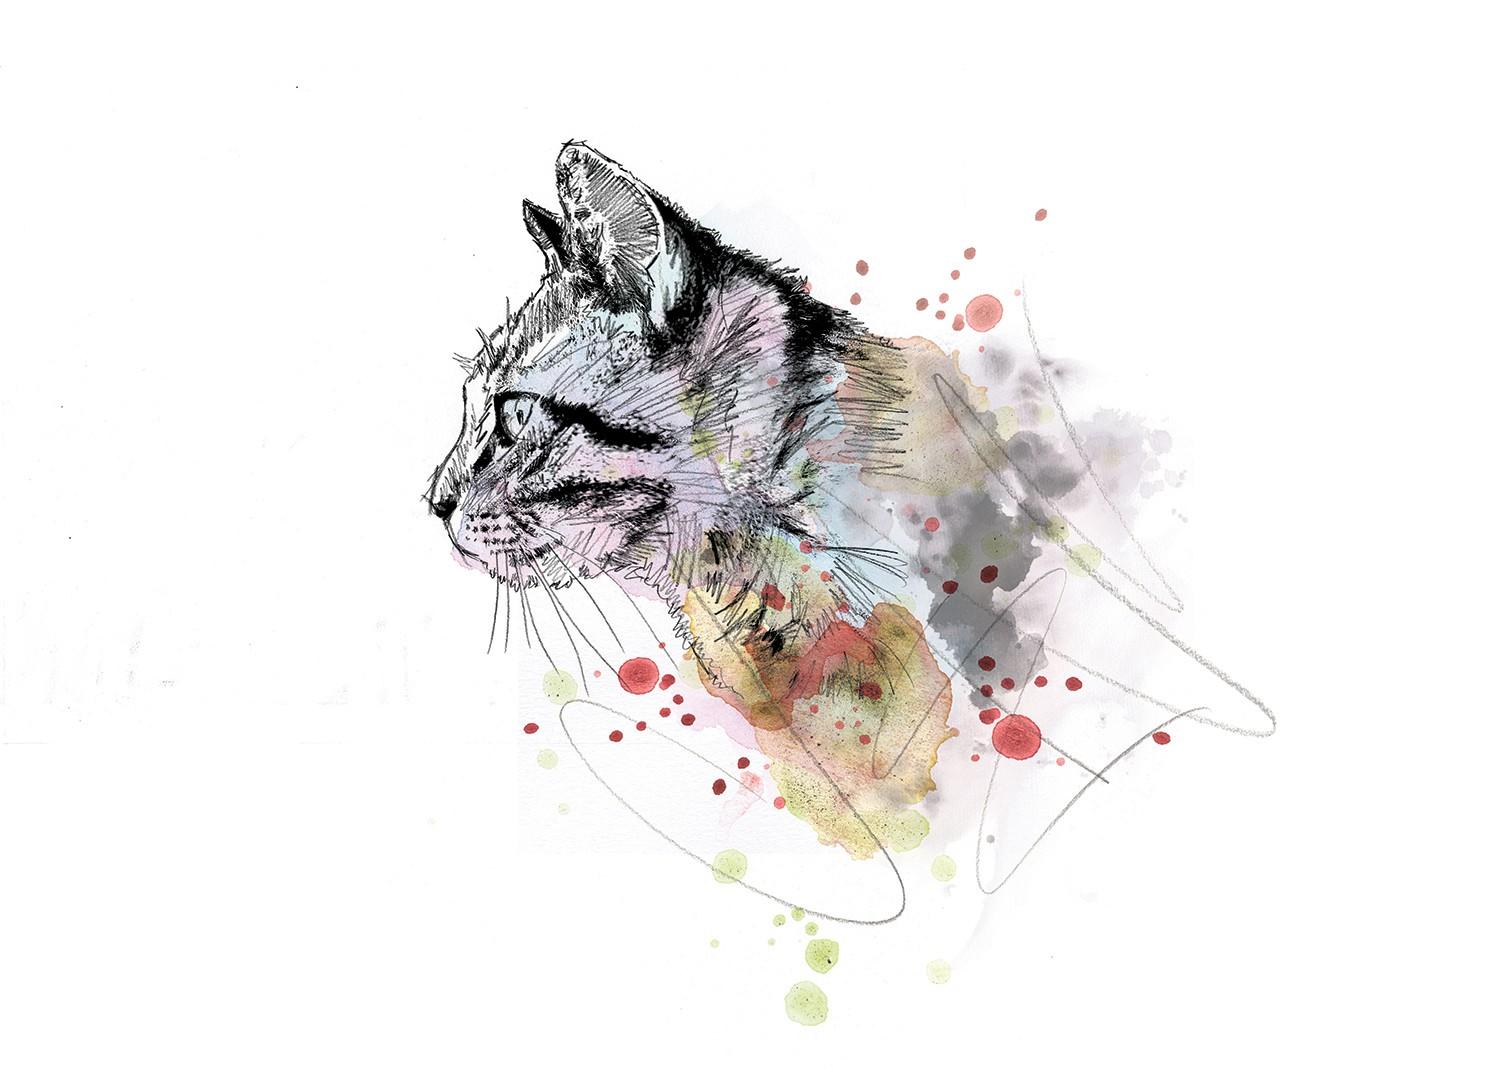 038 Dm Cats Curiosity The Cat Art